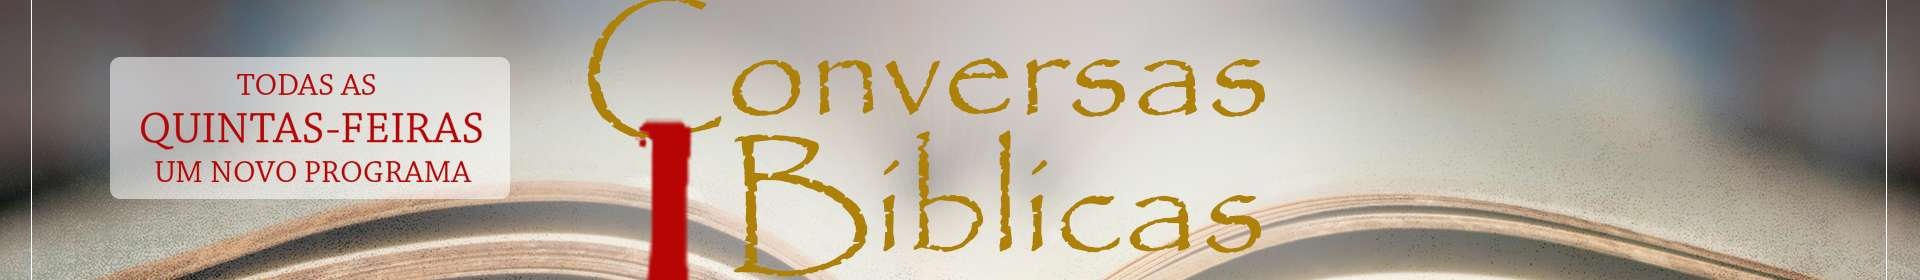 Conversas Biblicas: Corpo Vivo e Corpo Morto - Parte 2